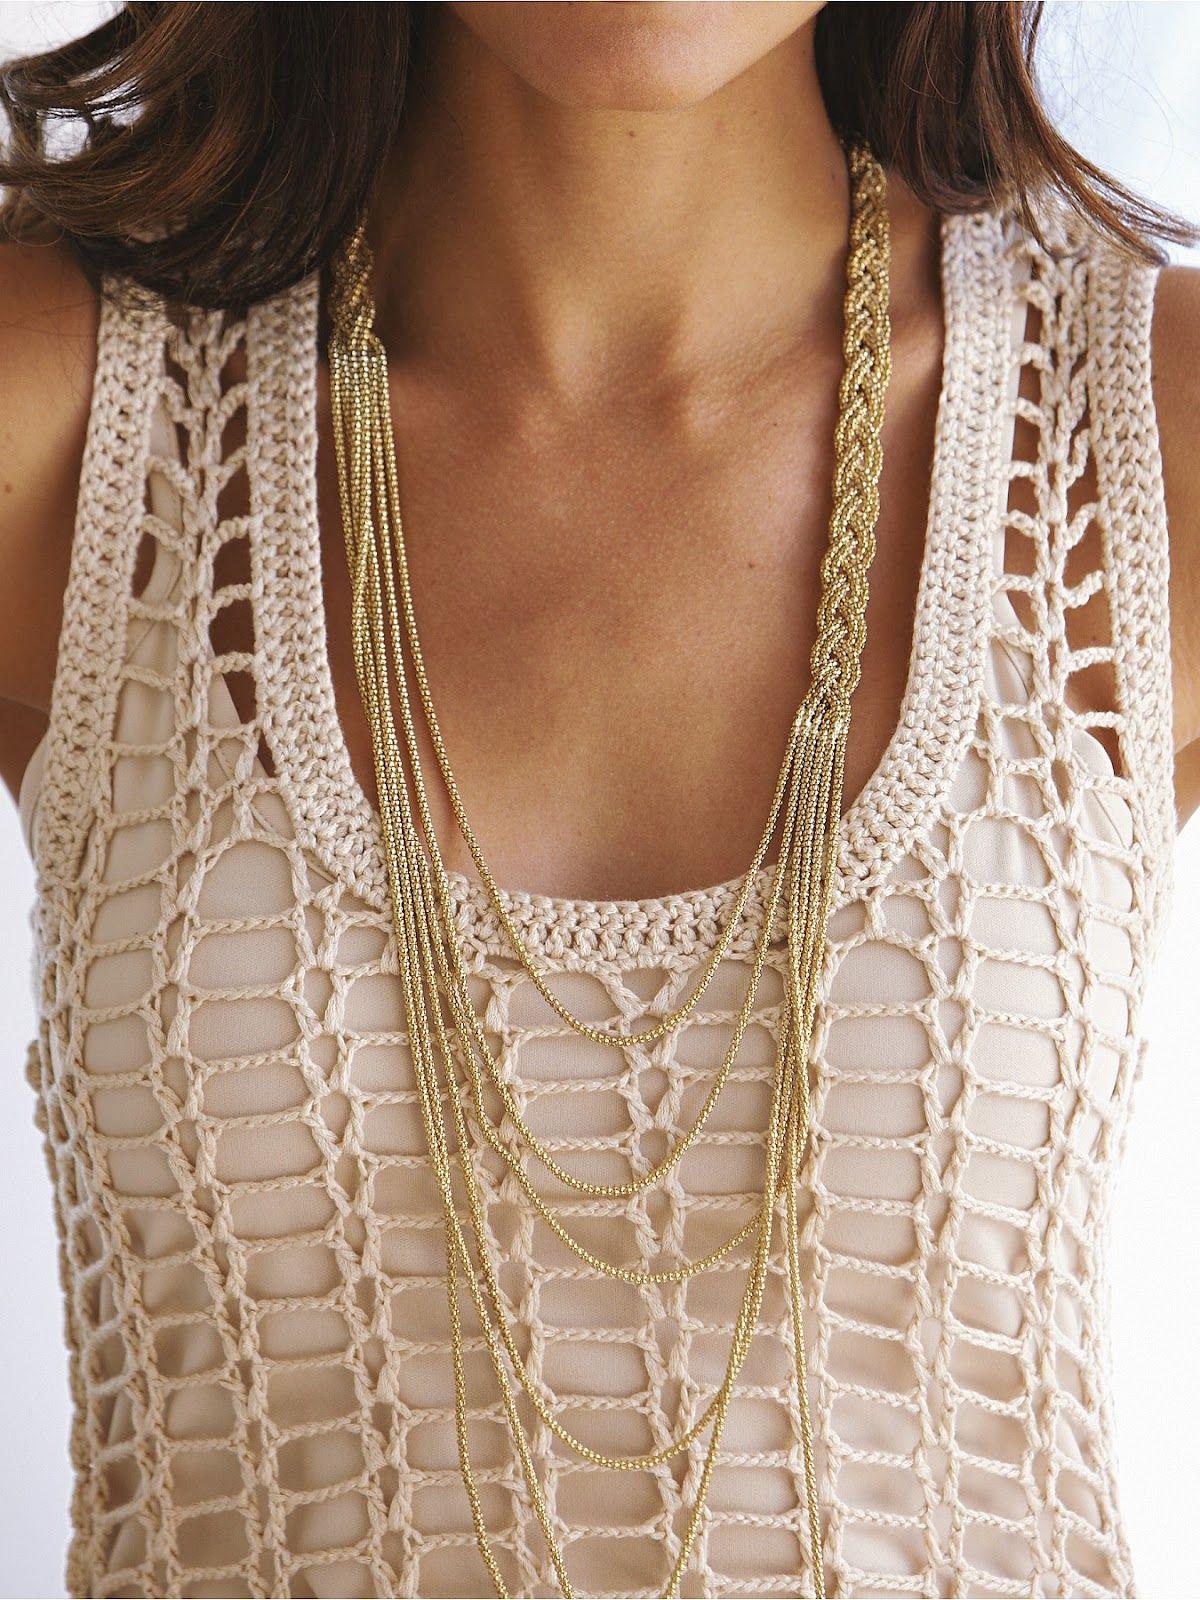 Crochet Patterns | Blouse top | Pinterest | Tipos de camisa, Tejido ...